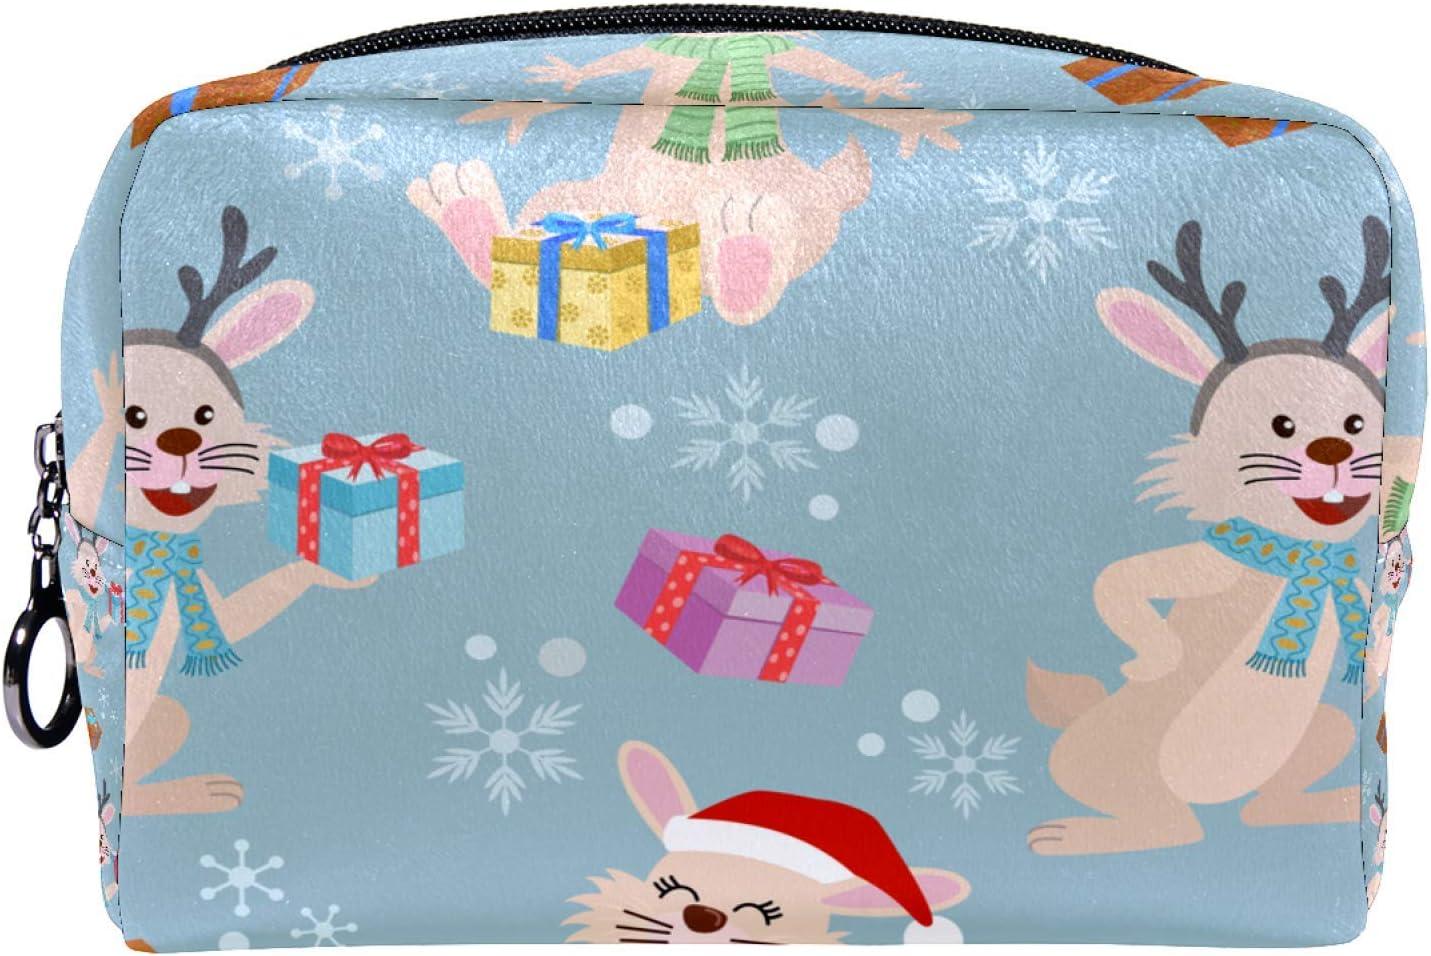 Makeup Toiletry Financial sales sale Regular dealer Bag for Women Kit Organize Purse Cosmetic Travel